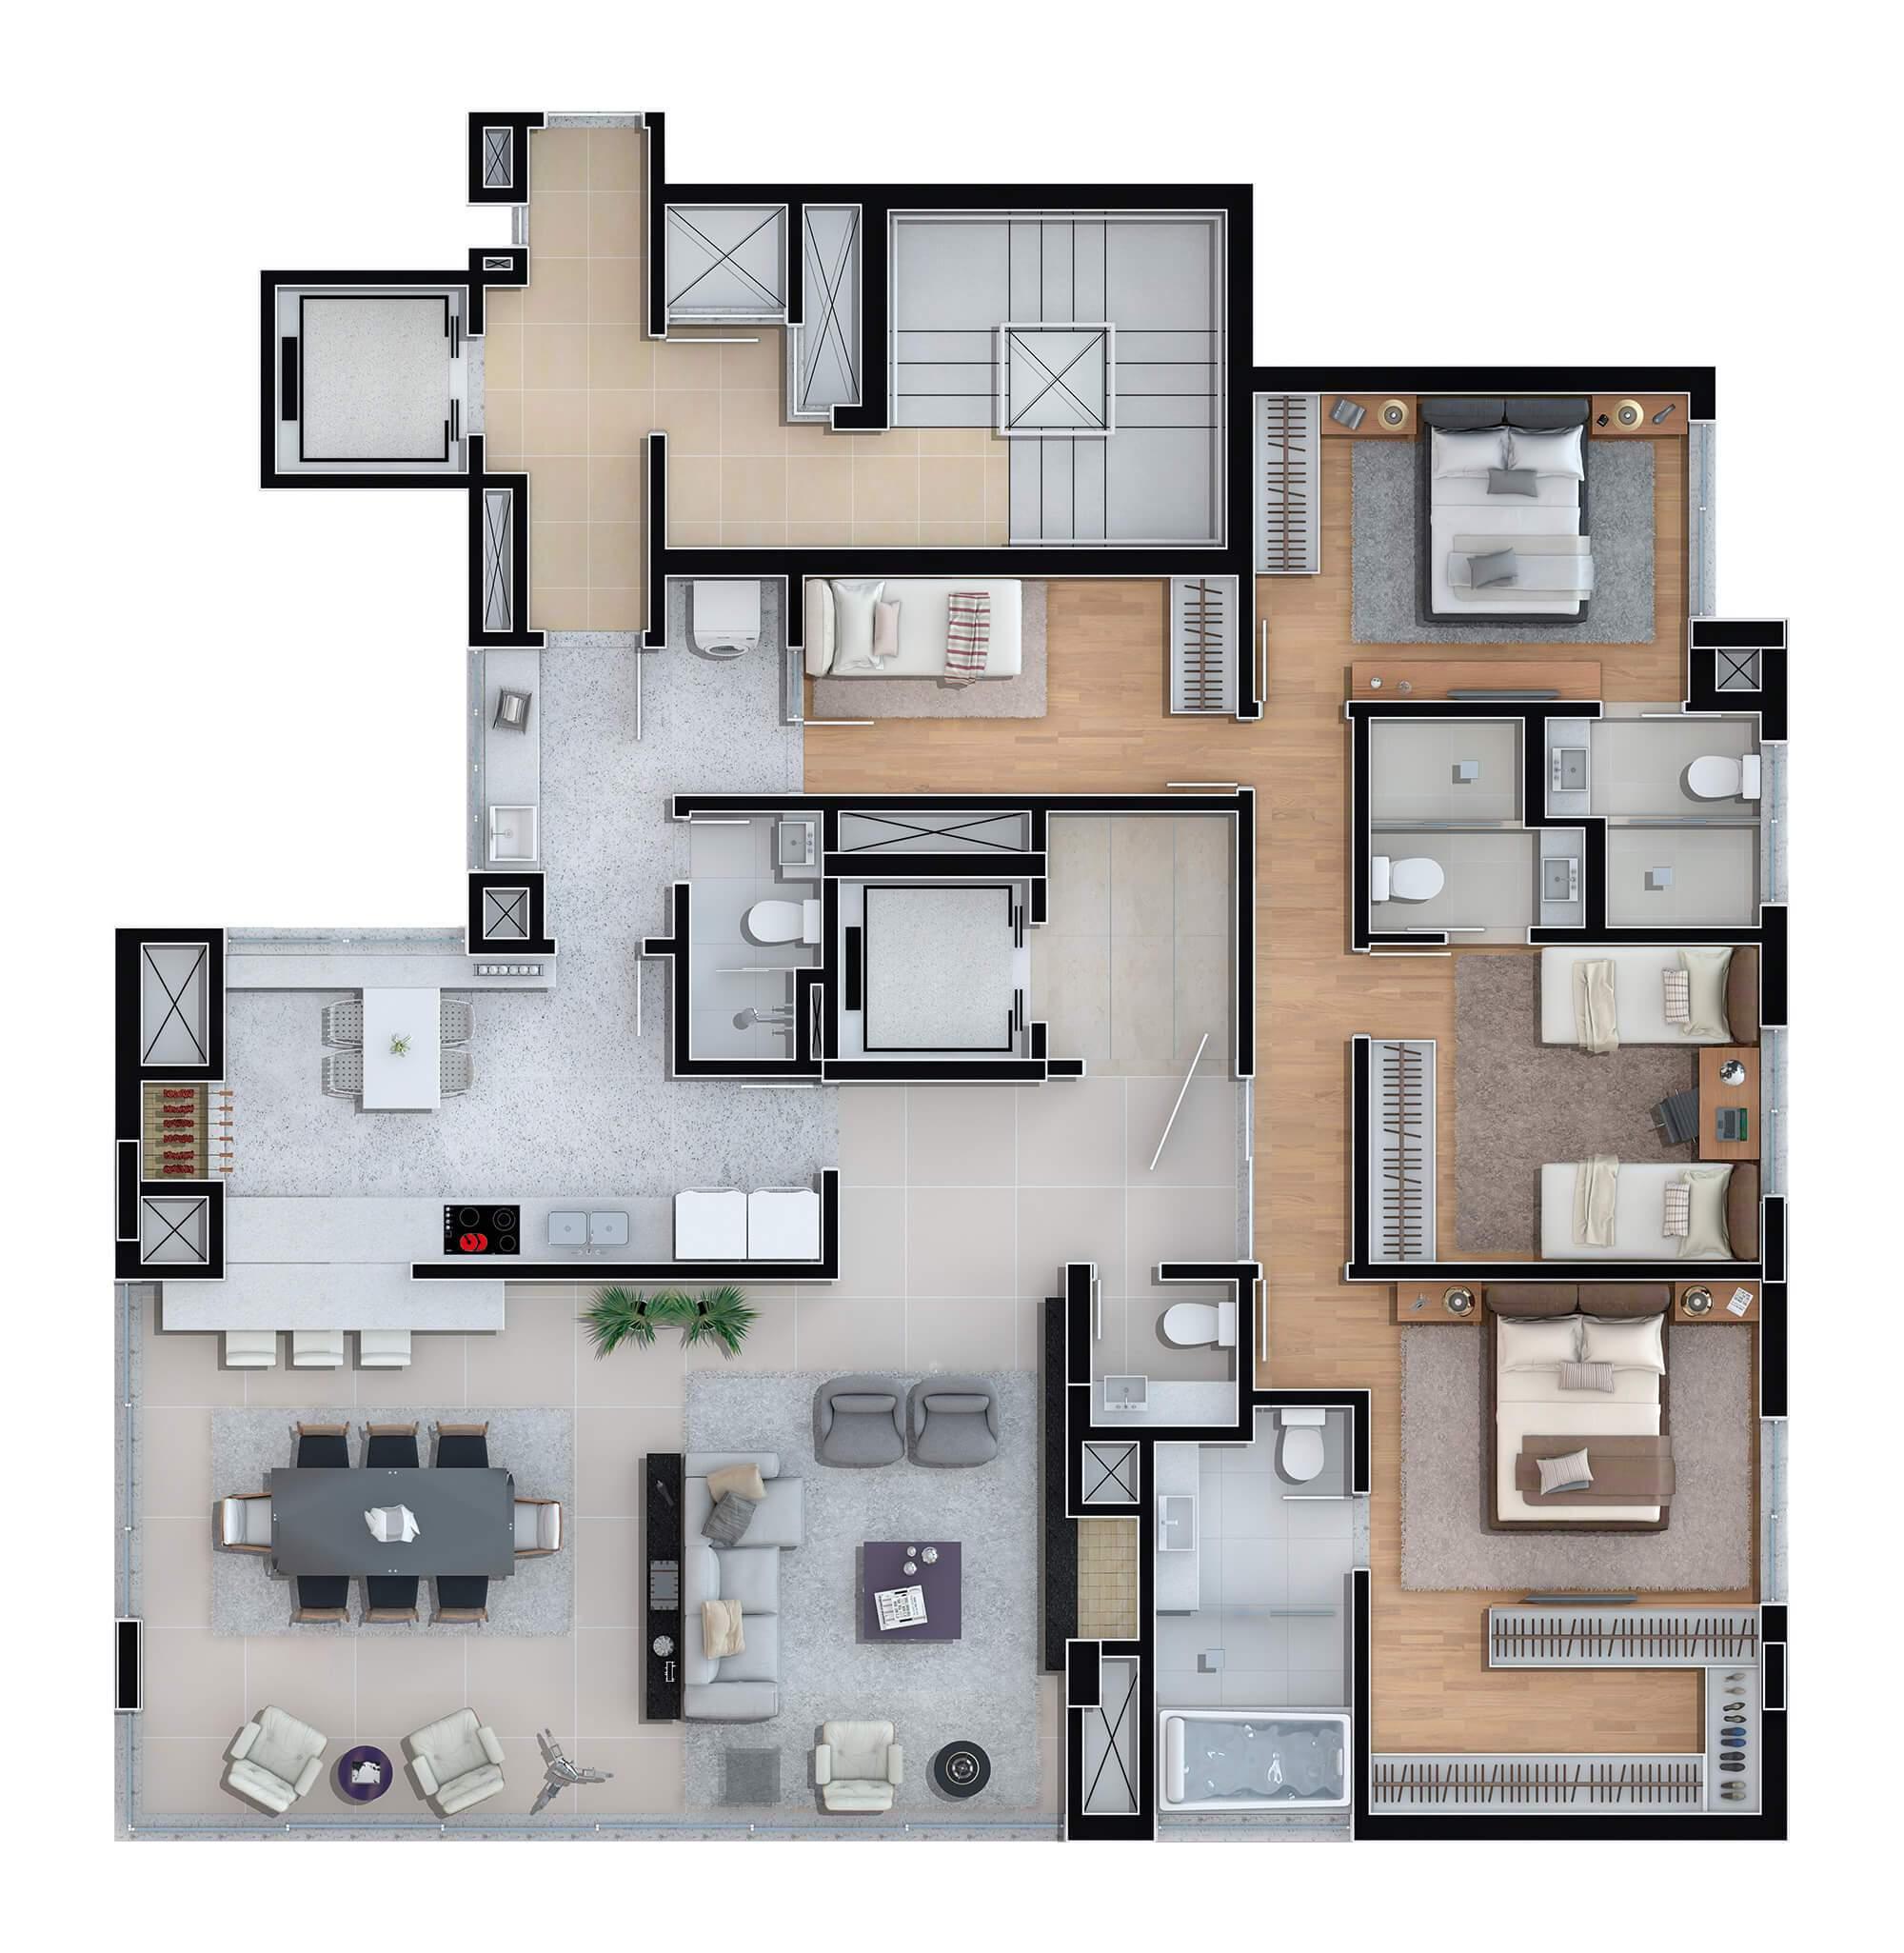 Olimpo planta: Apartamentos  170,50 m², 2 por andar